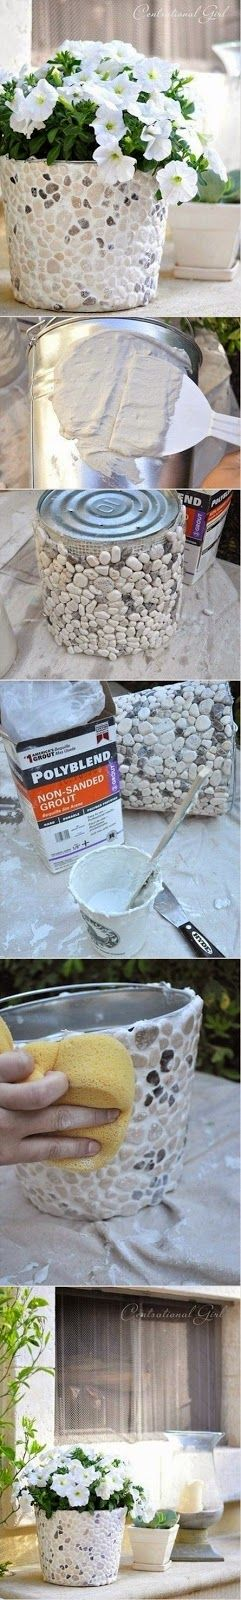 DIY Rock Covered Bucket!